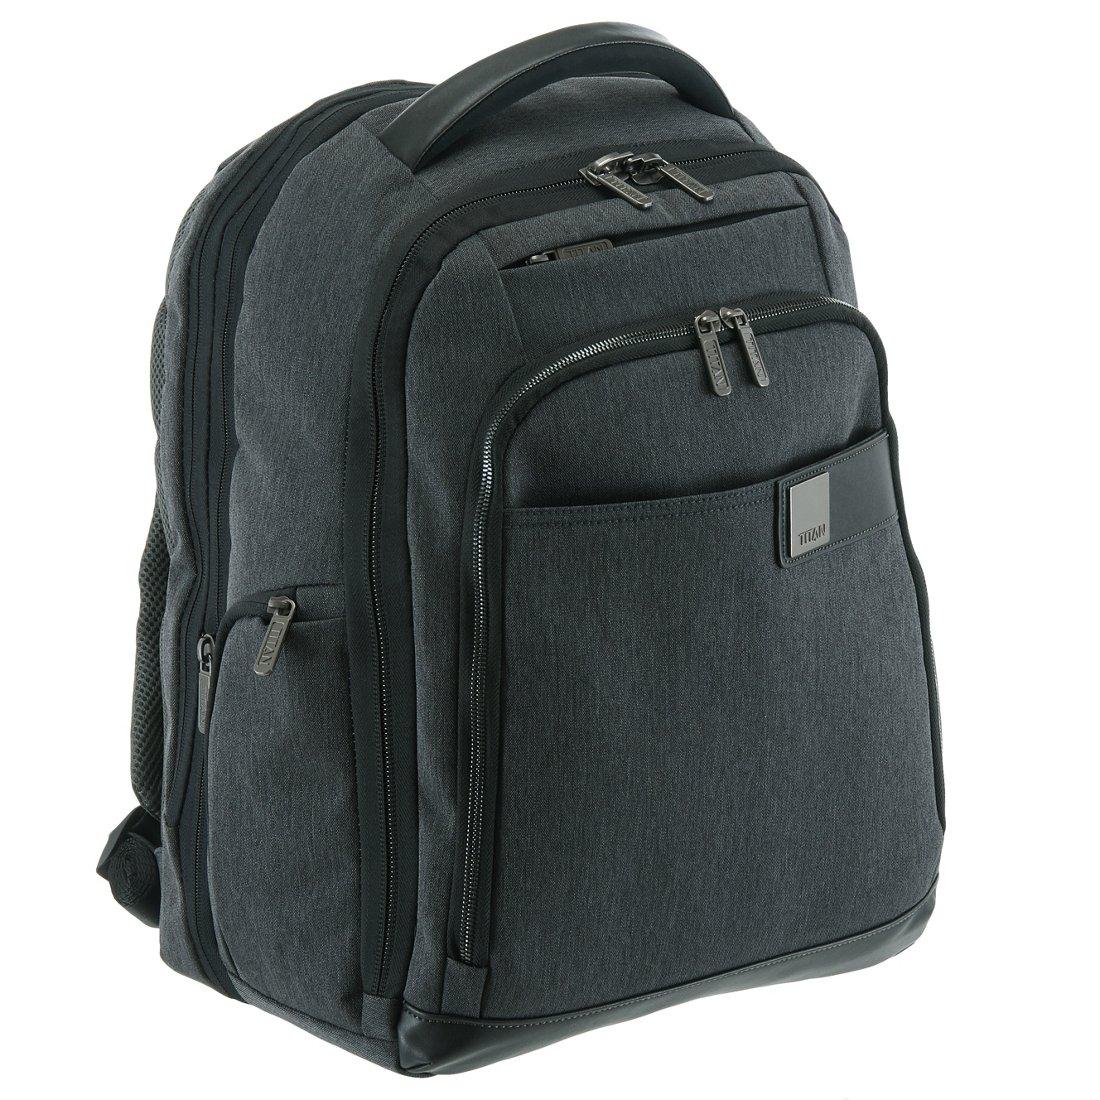 TITAN Power Pack Laptop Bag Umhängetasche Aktentasche Mixed Grey Grau Schwarz